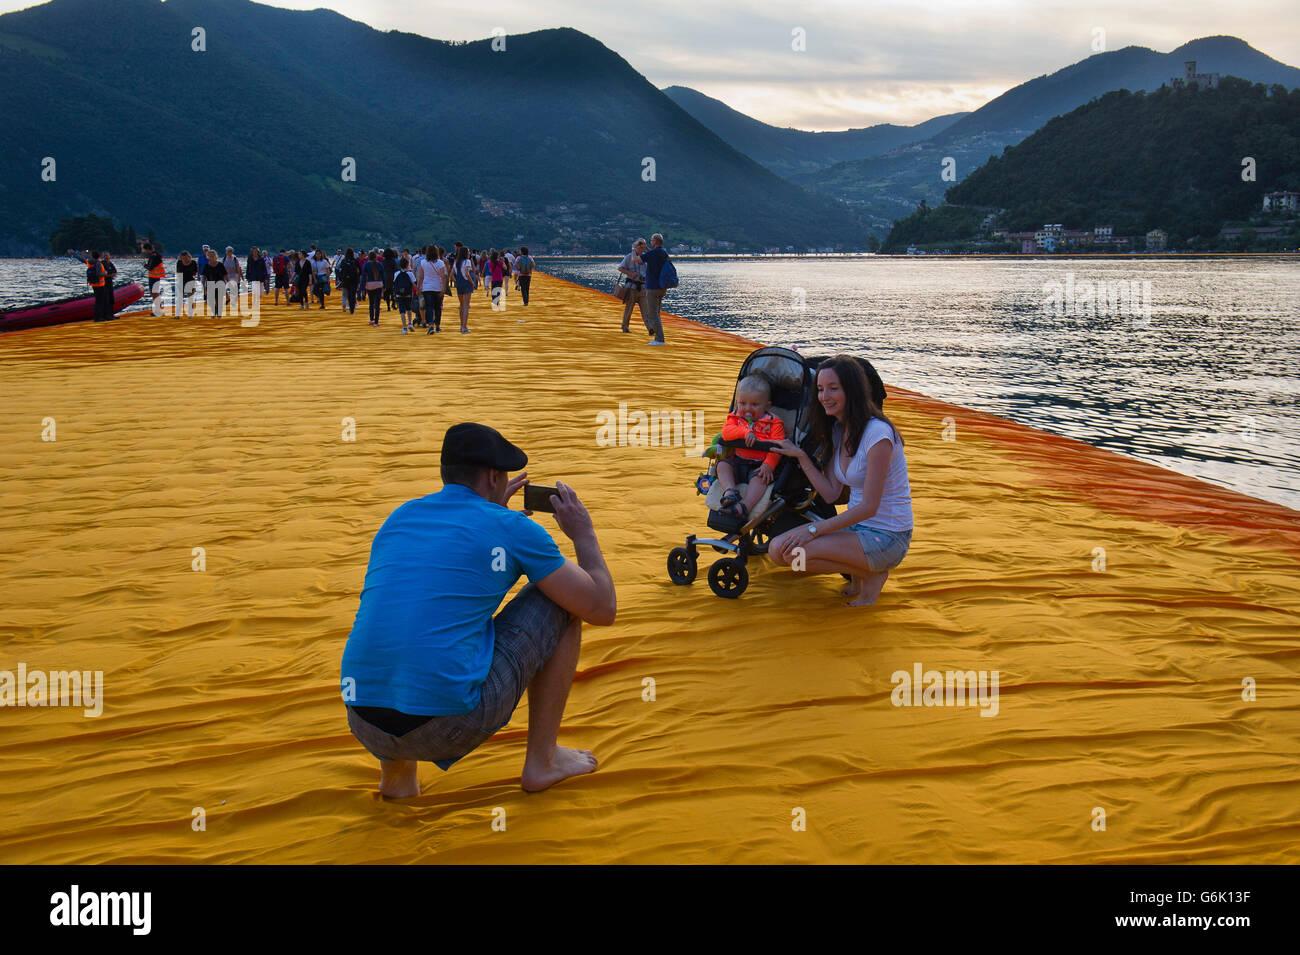 Lake Iseo Italy. Lombardy Christo Vladimirov Yavachev realized The Floating Piers linking Sulzano with Montisola - Stock Image